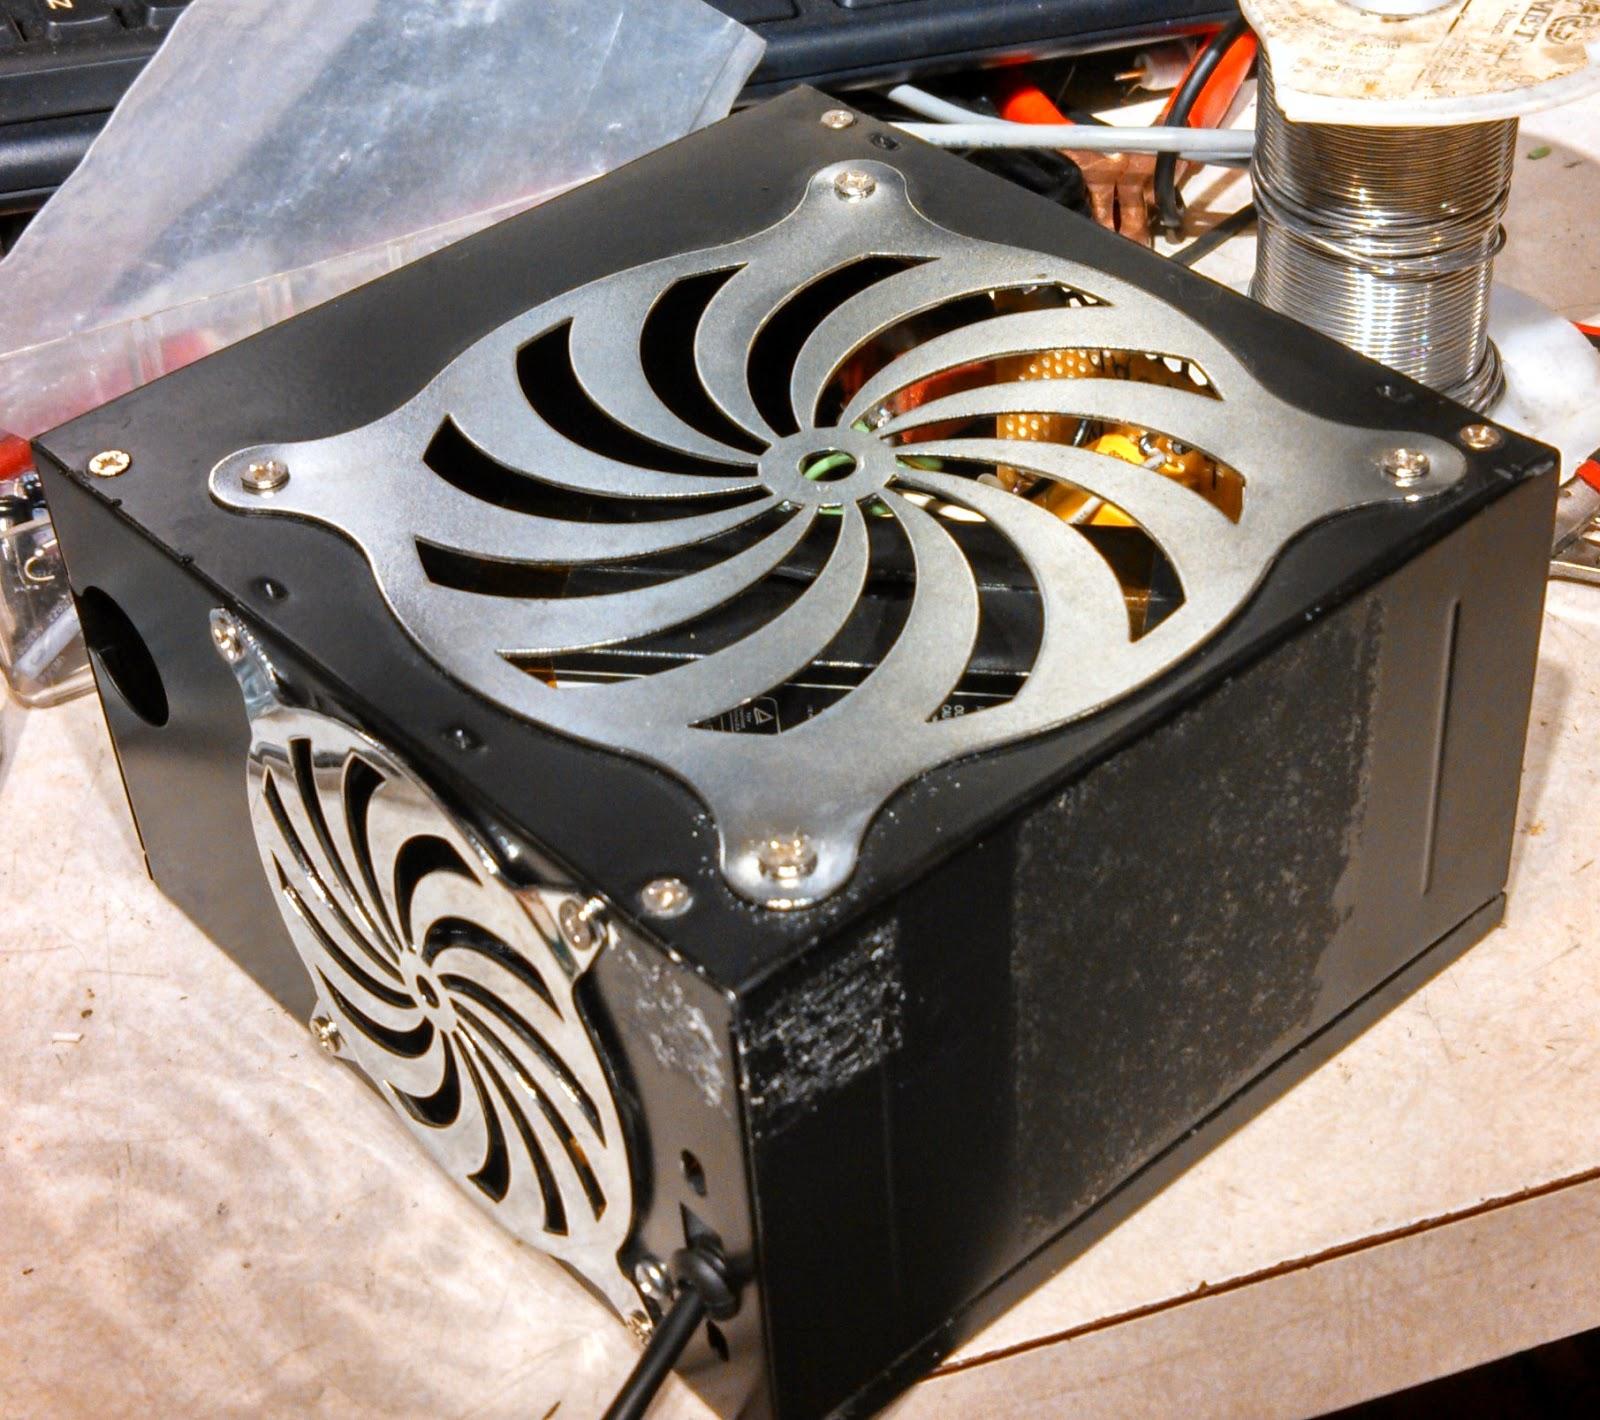 YnJ1dGUtZm9yY2UtYWMtbGluZS1maWx0ZXItc2NoZW1hdGlj as well pletely Containing Switching Power as well  on reducing switching supply racket rf